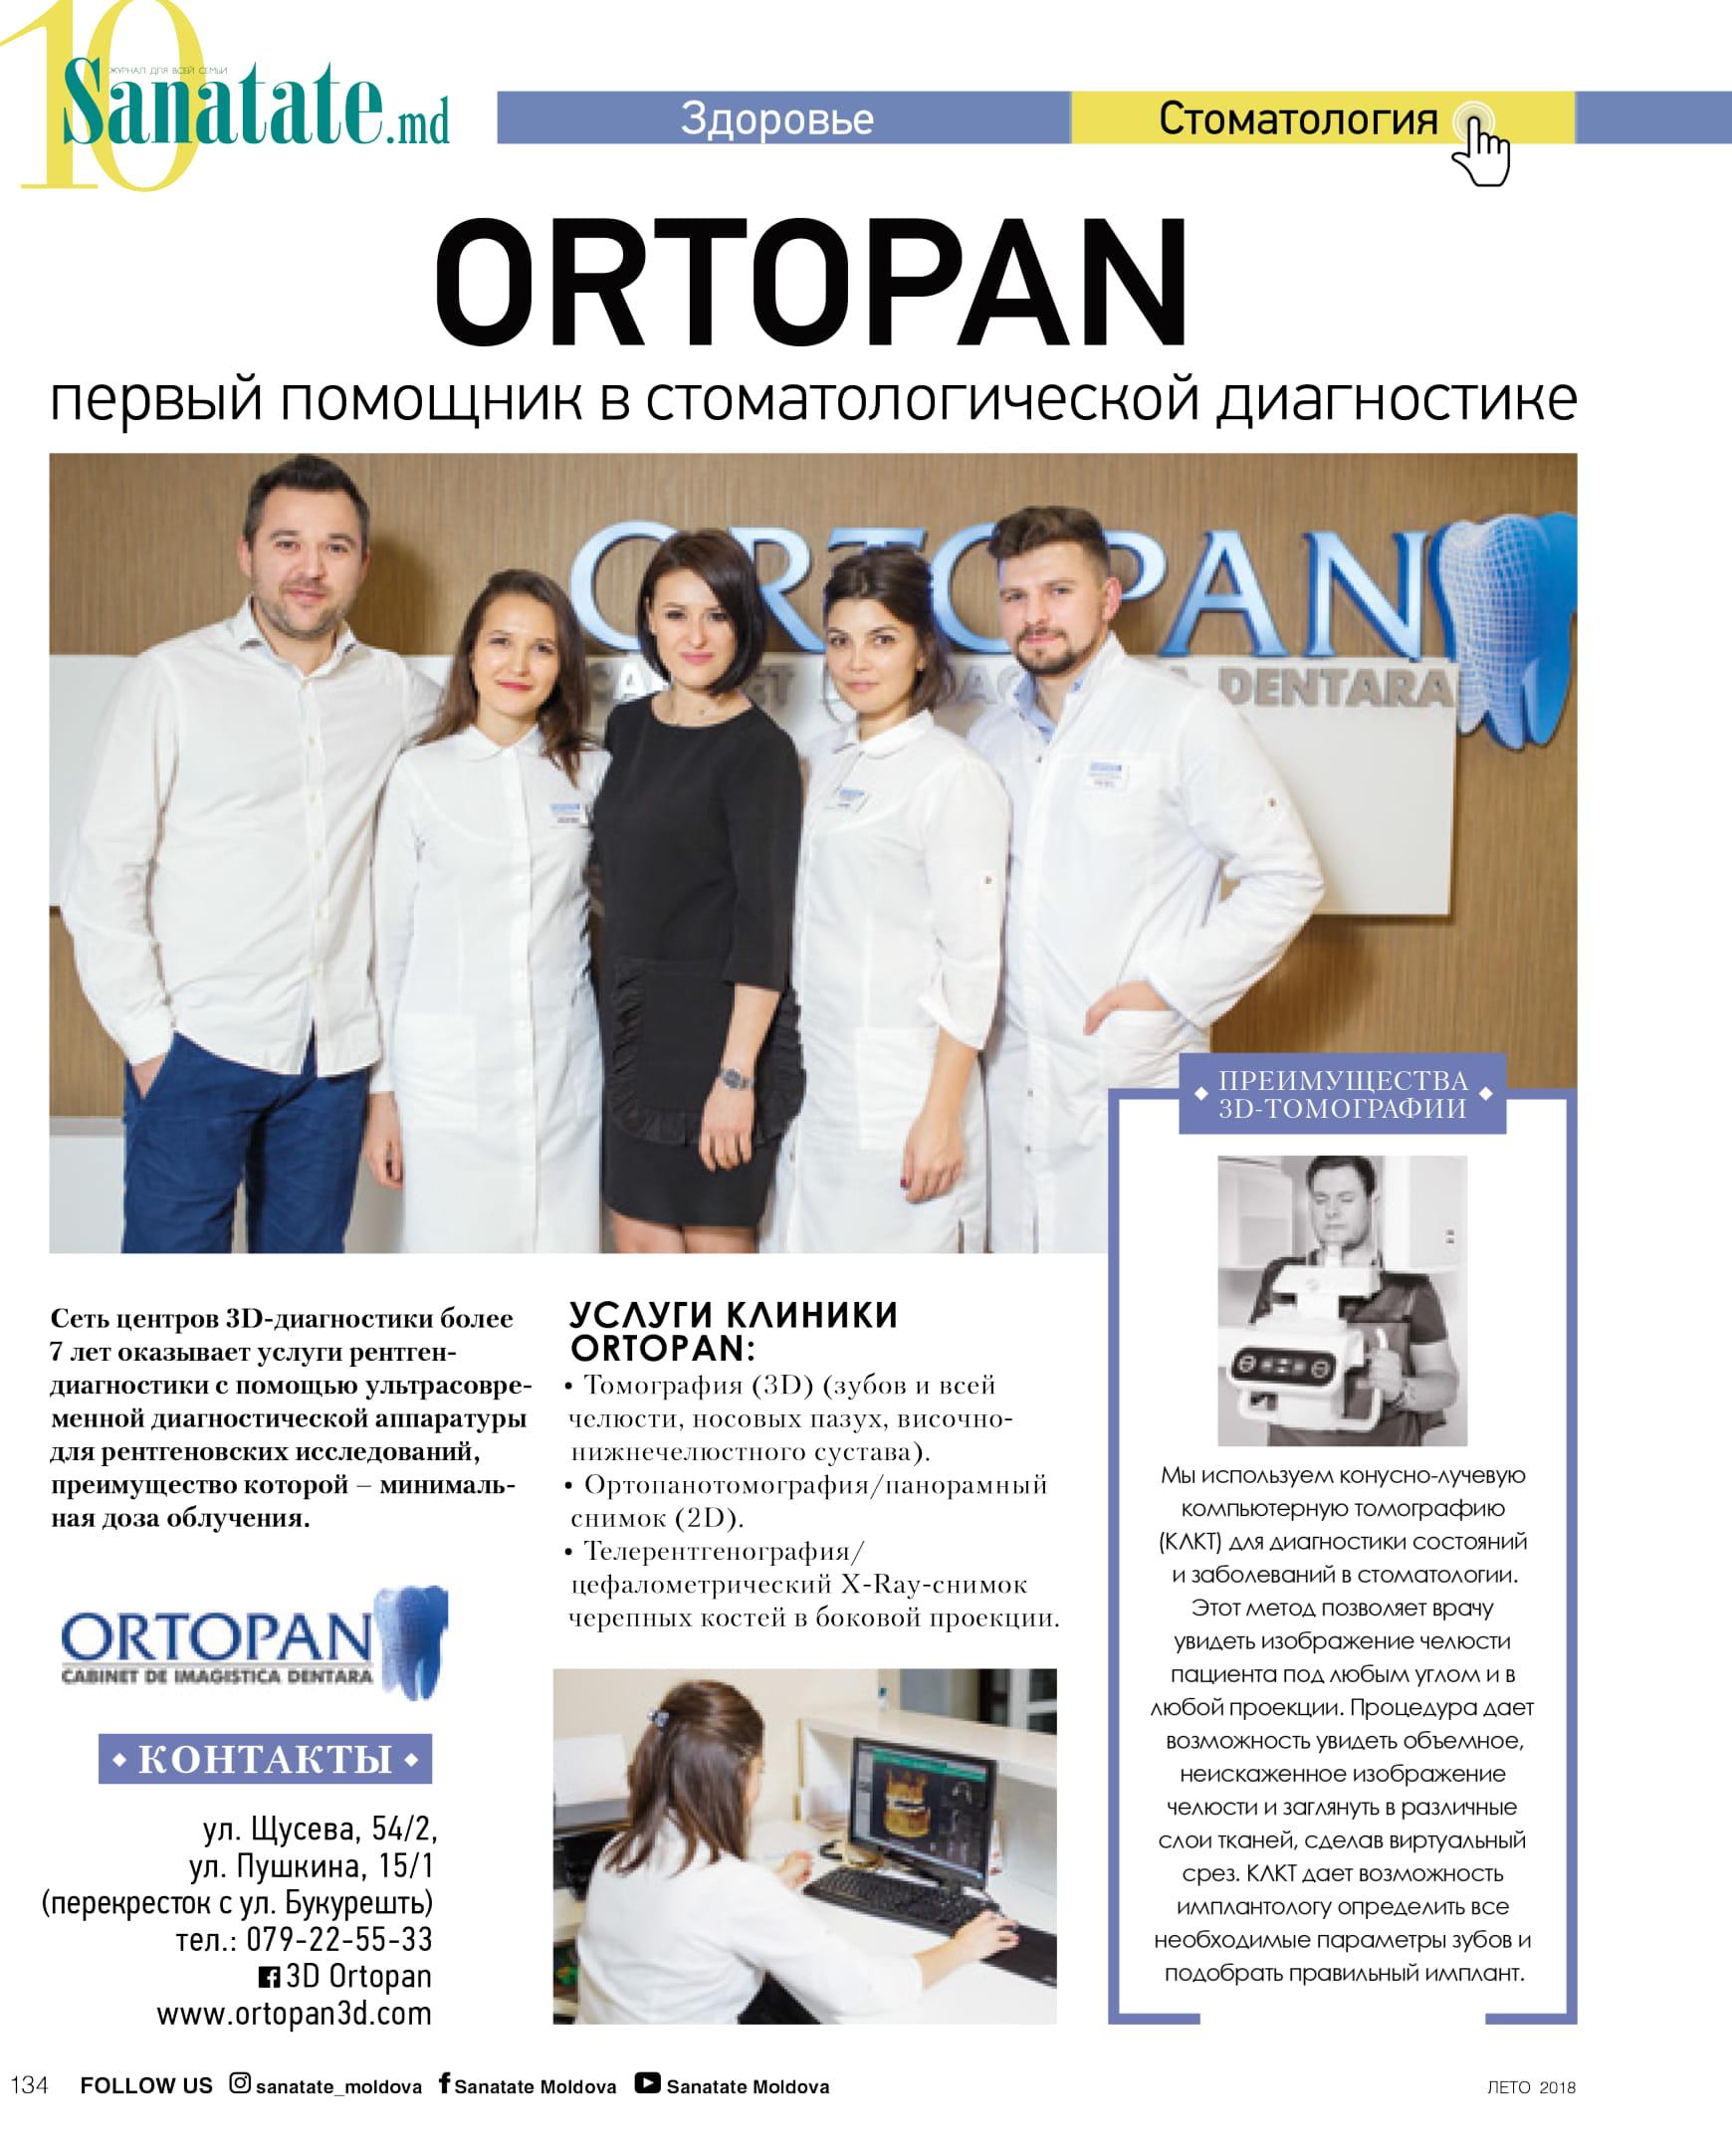 sanatate-ortopan